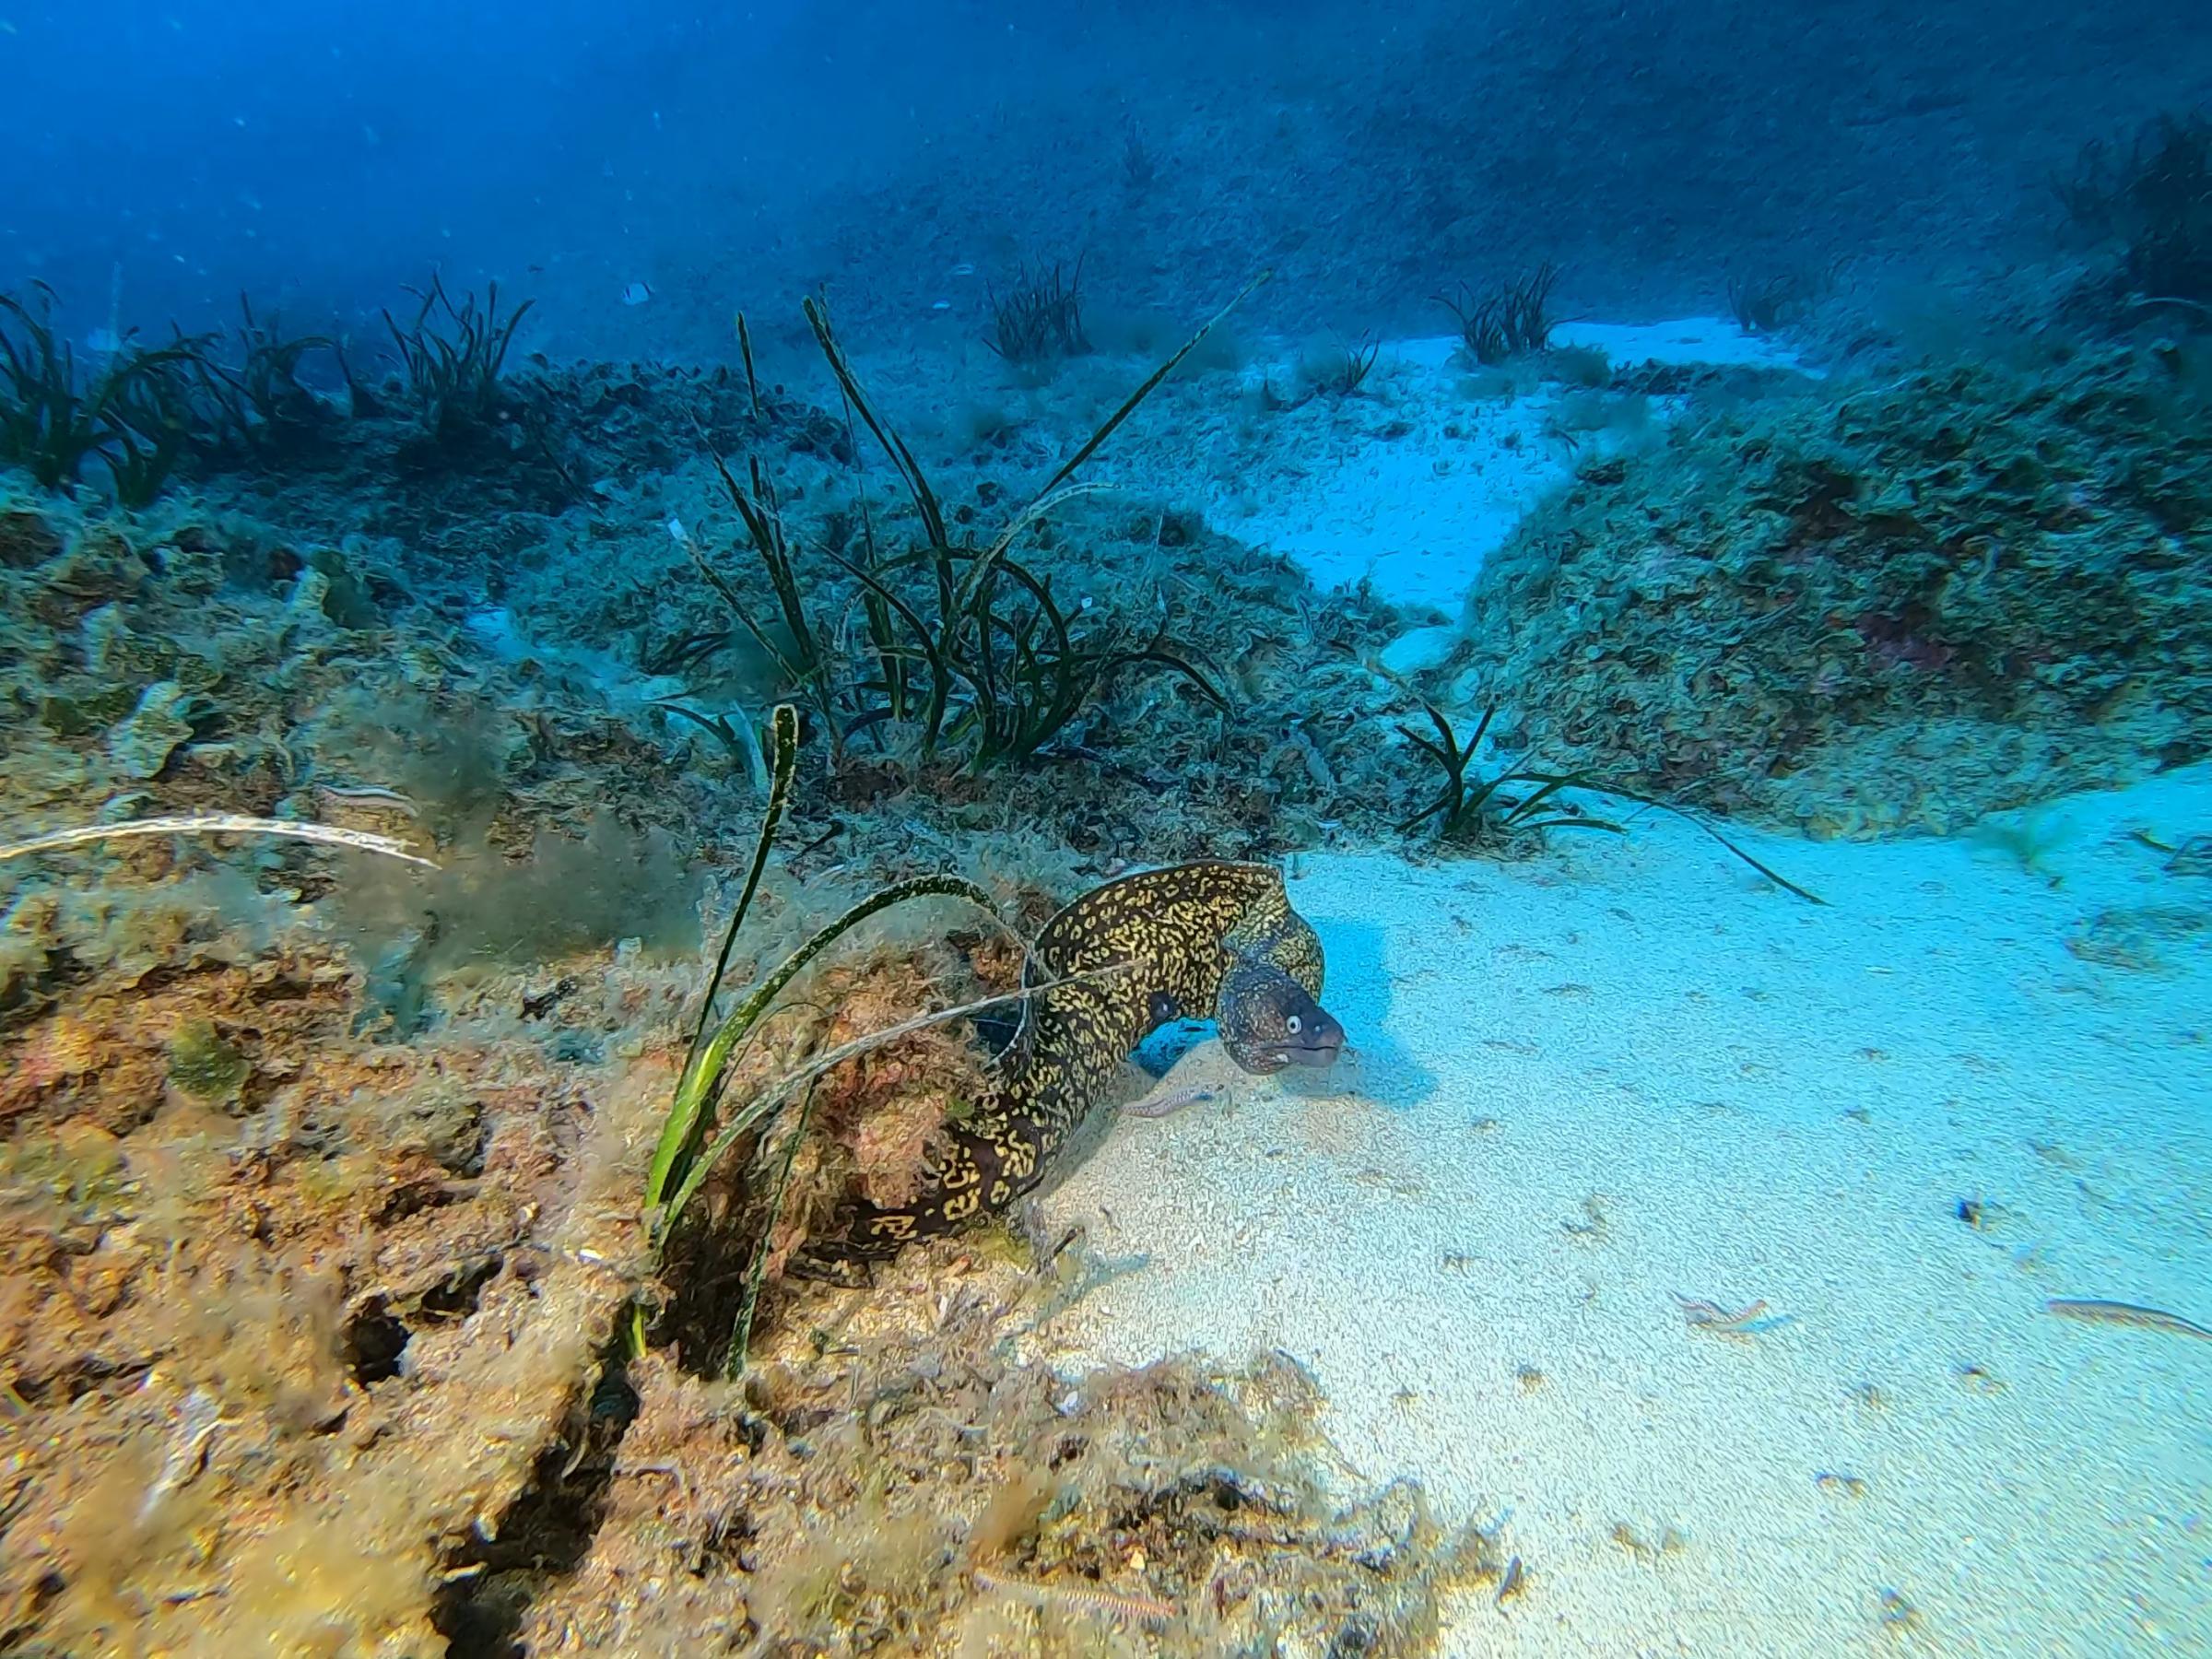 Moray eel [Adam Sant]